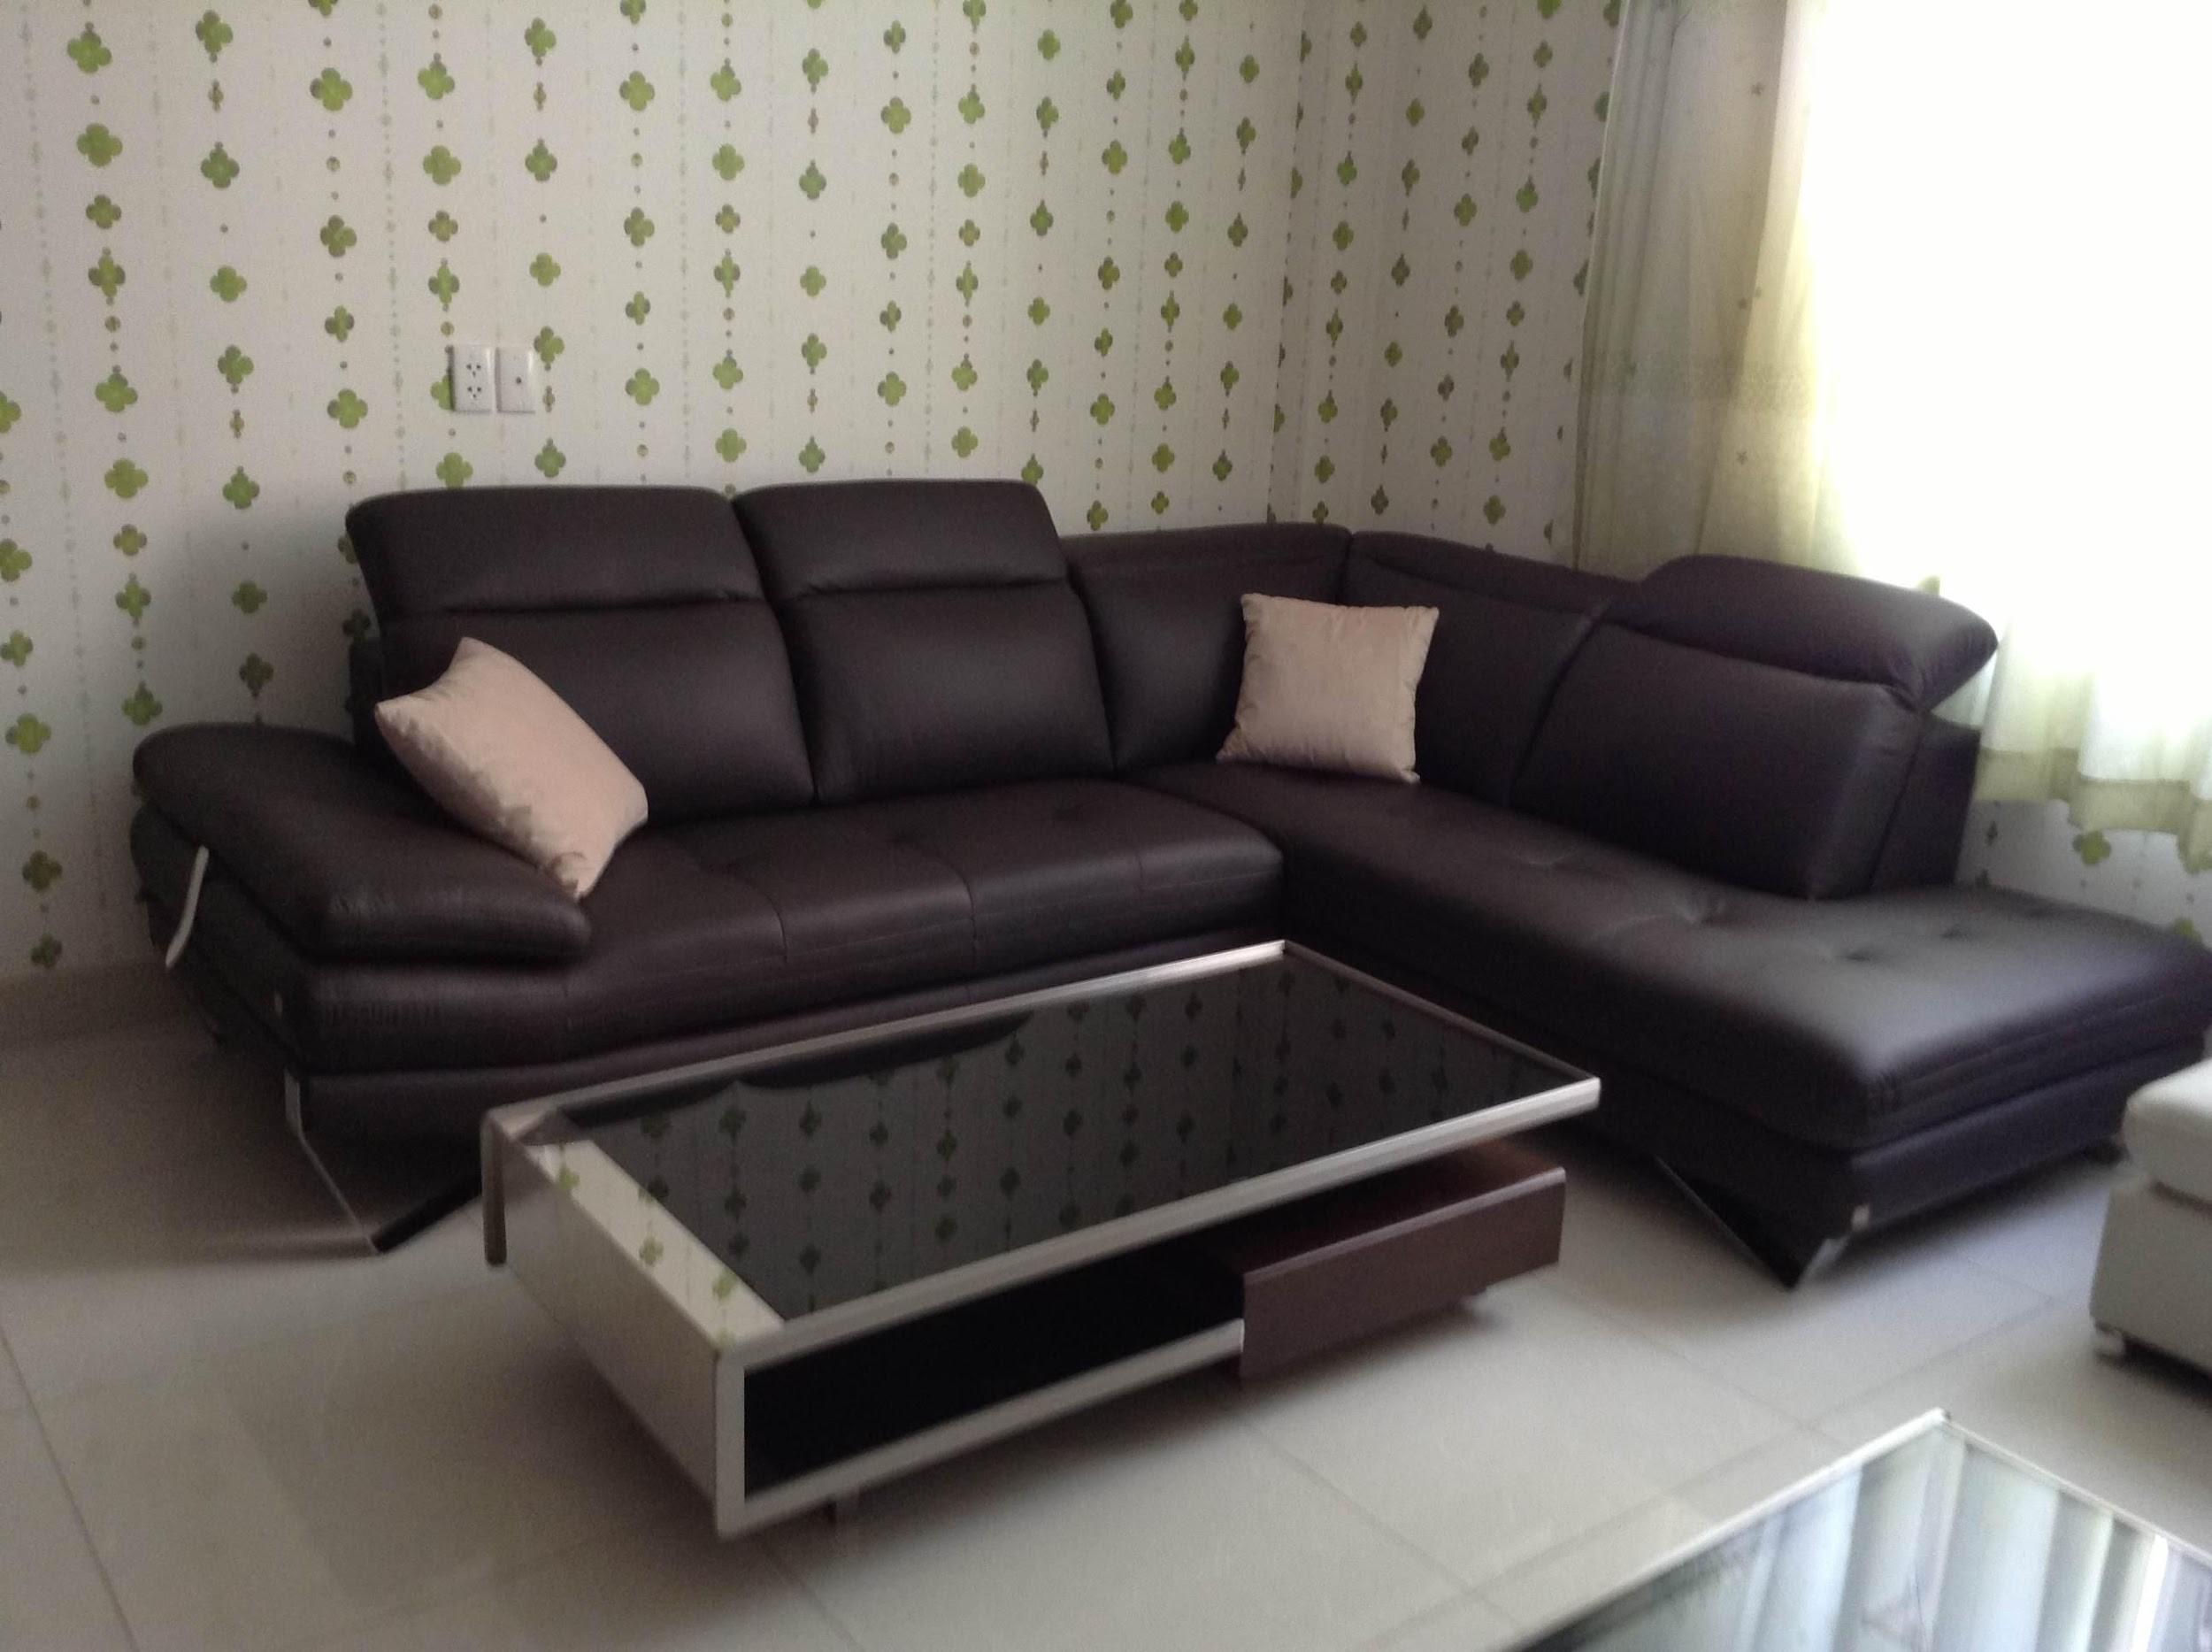 Sofa da giải pháp cho mùa nóng oi bức